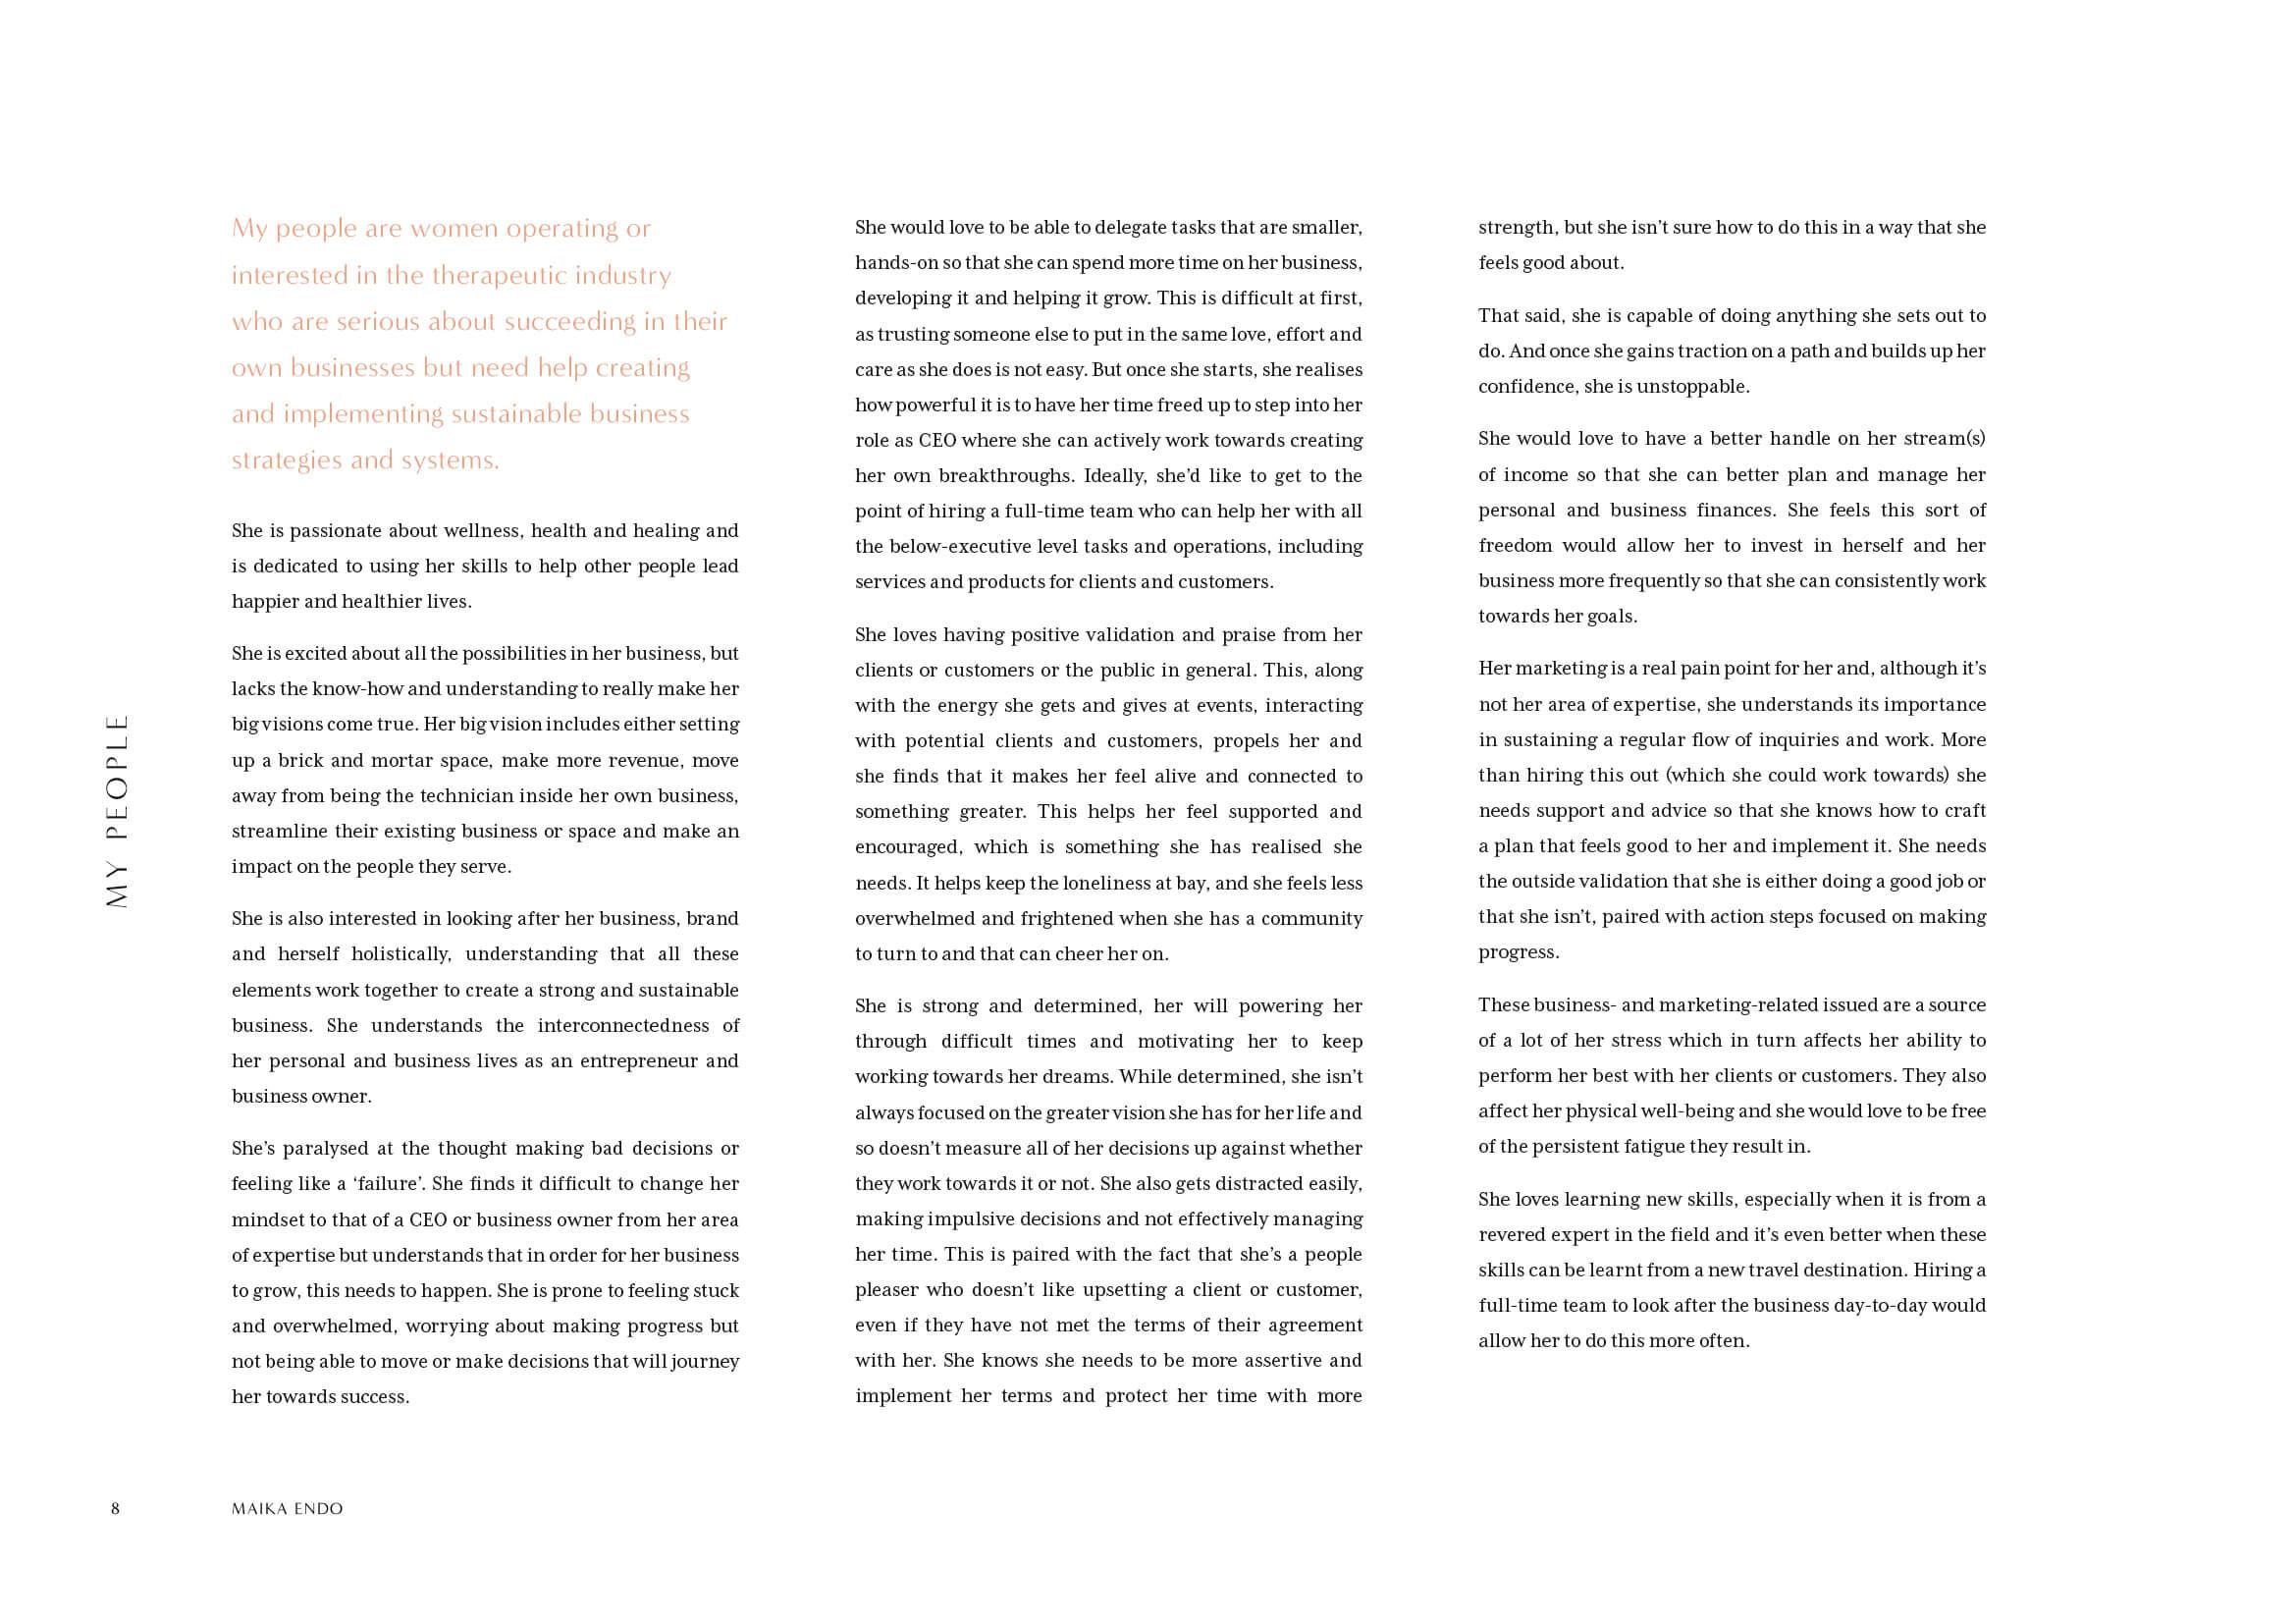 Maika Endo Strategy Manual8.jpg